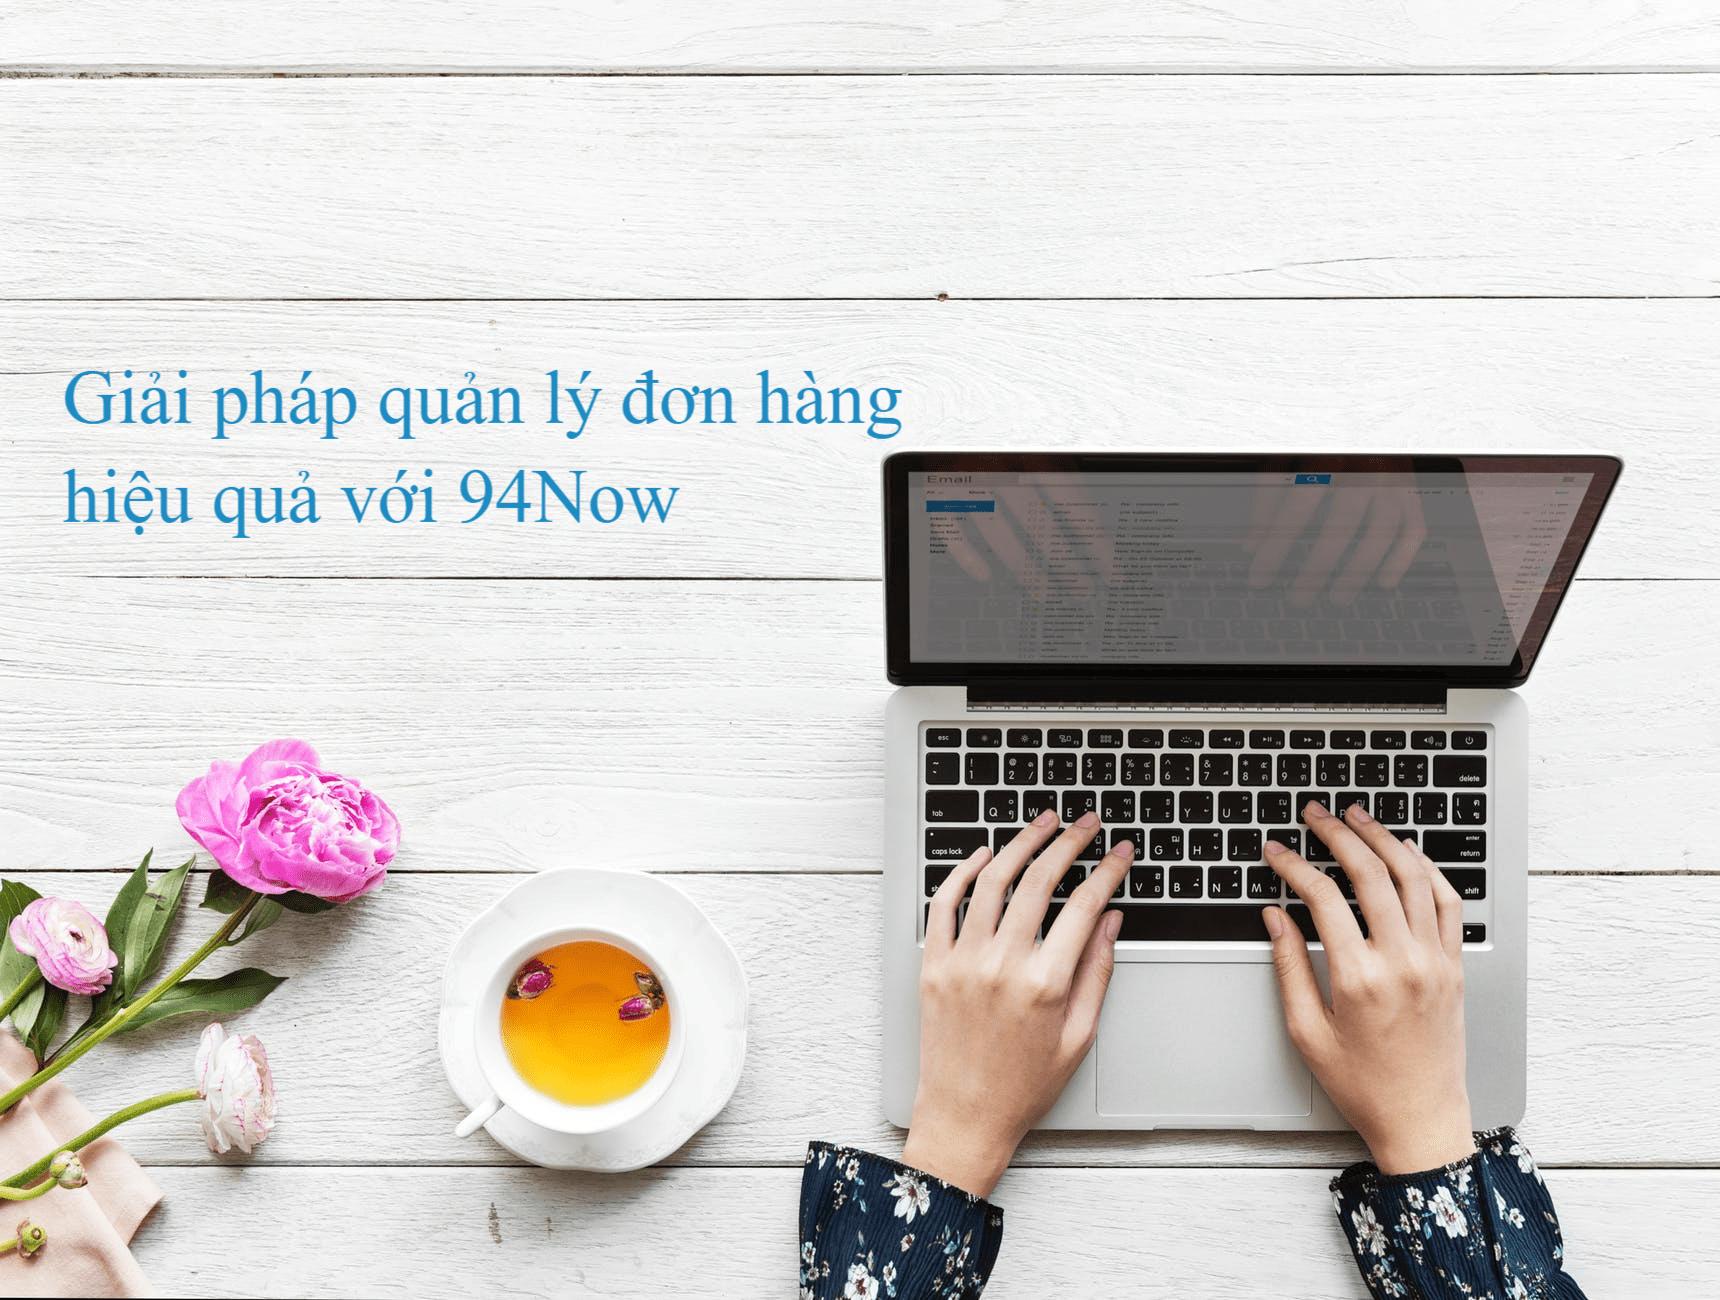 quan-ly-don-hang-hieu-qua-cho-doanh-nghiep-94Now